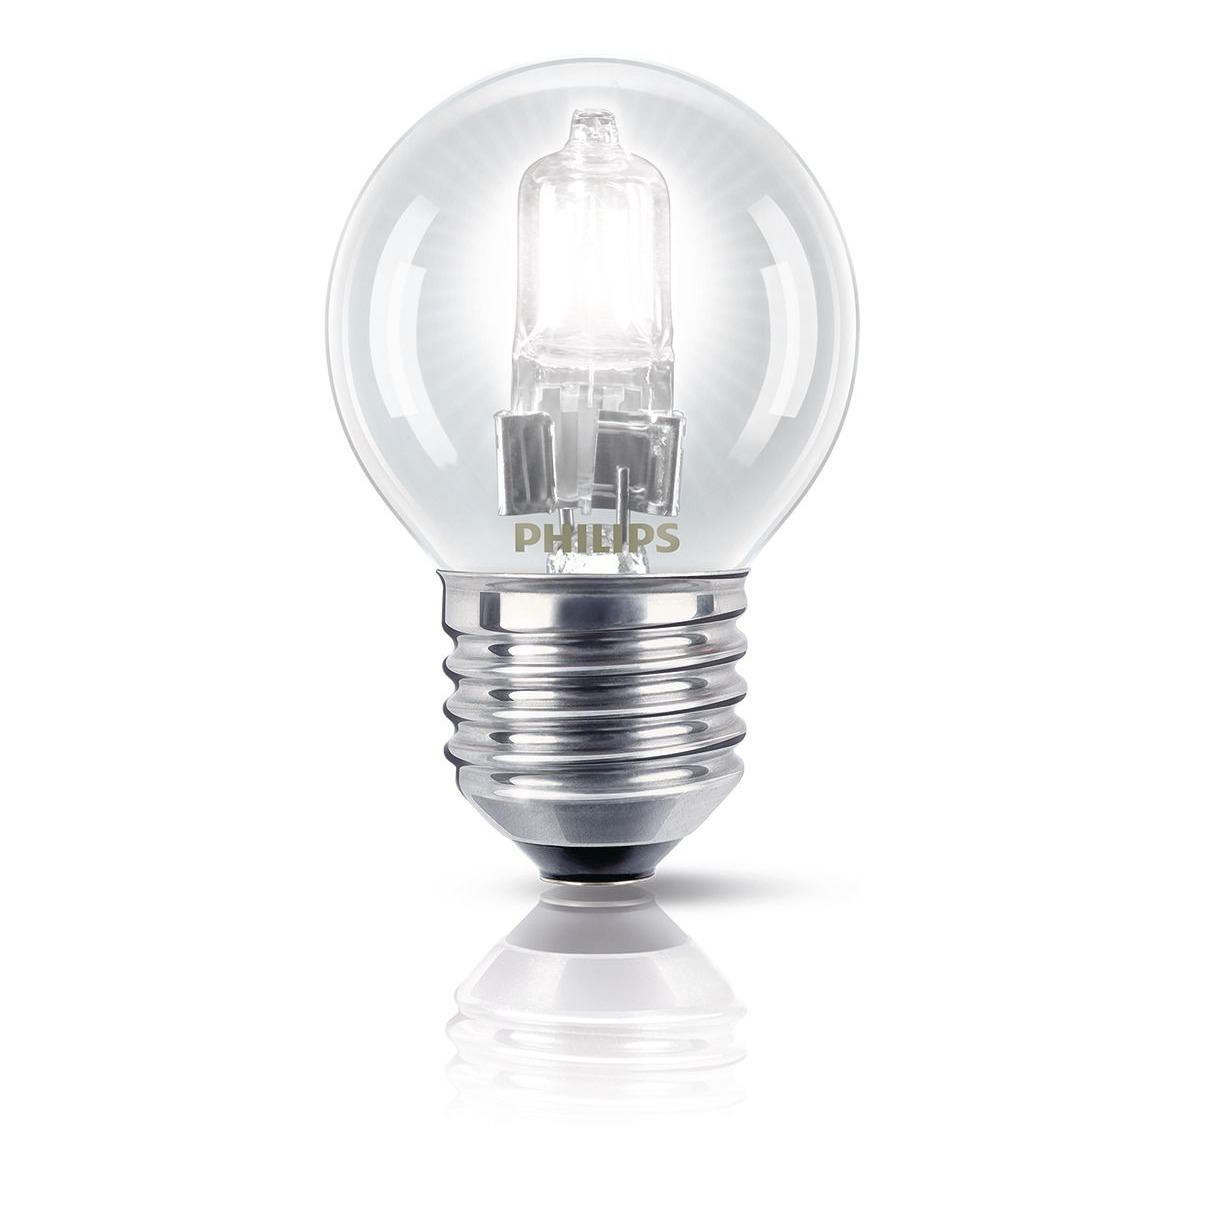 Philips halogeenlamp E27 28W 370Lm kogel